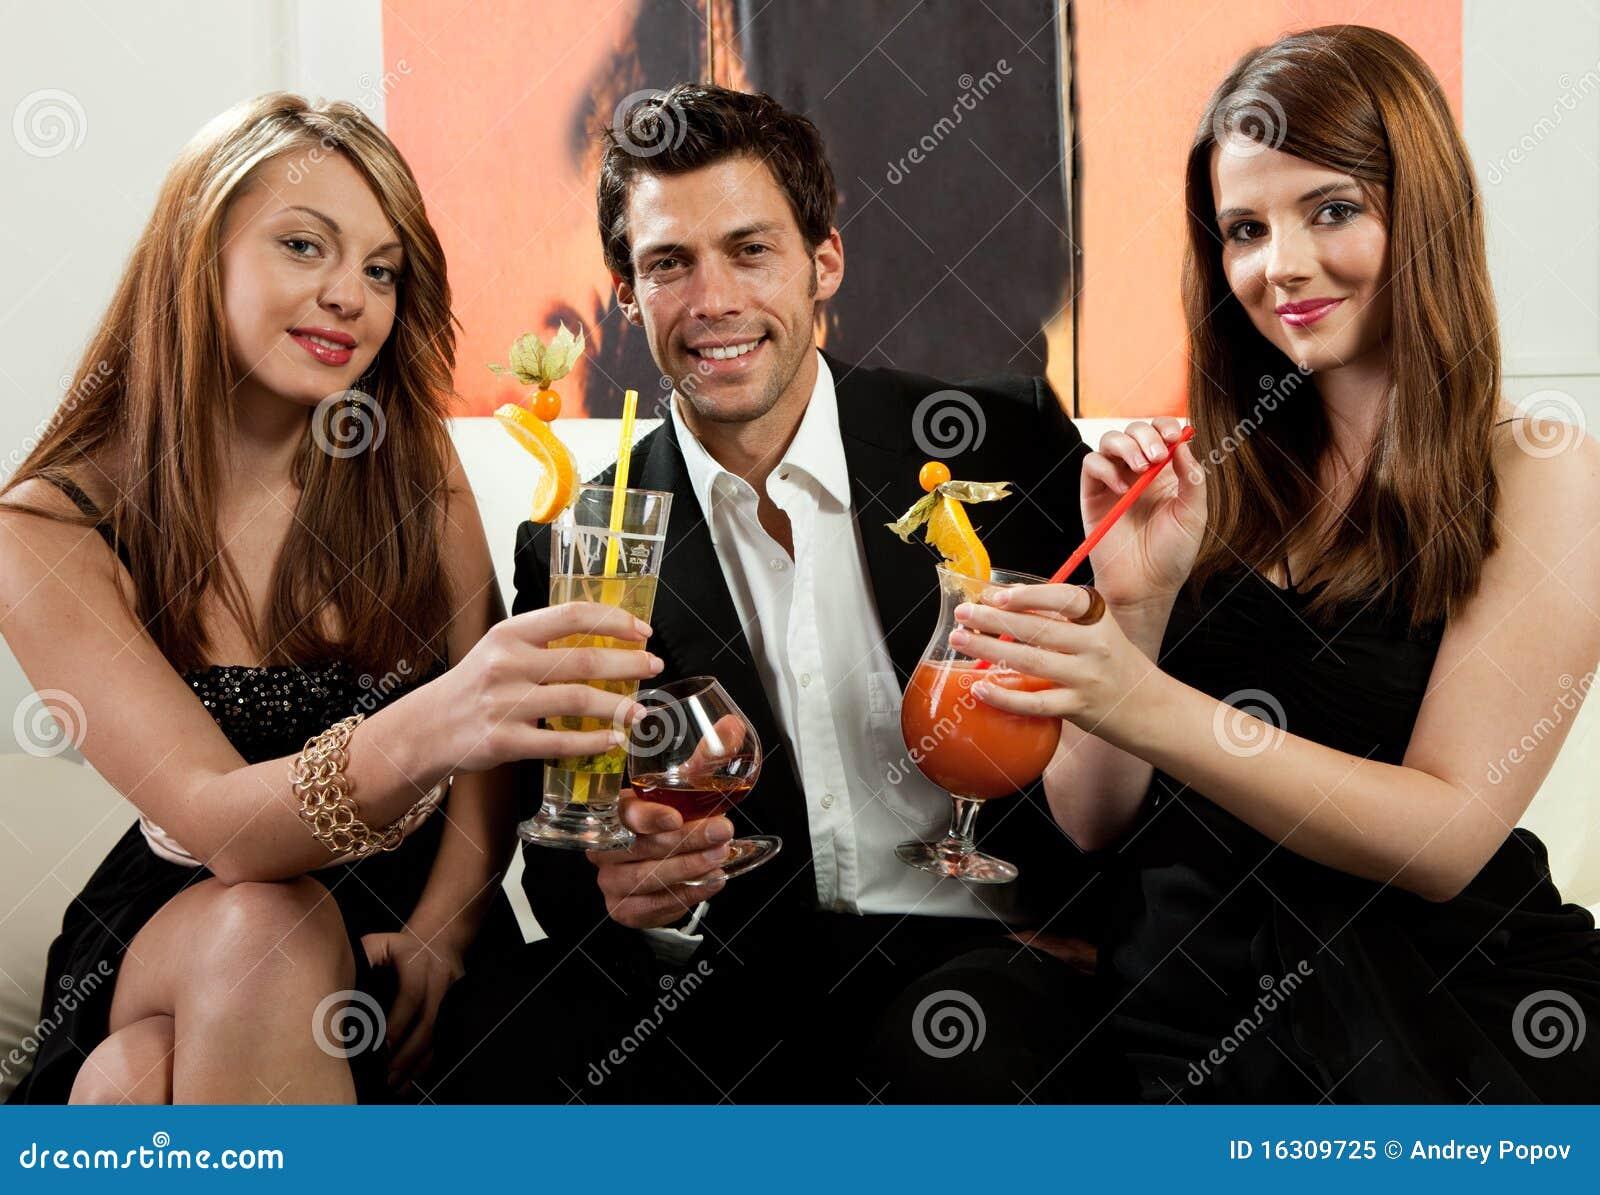 Friends having good time